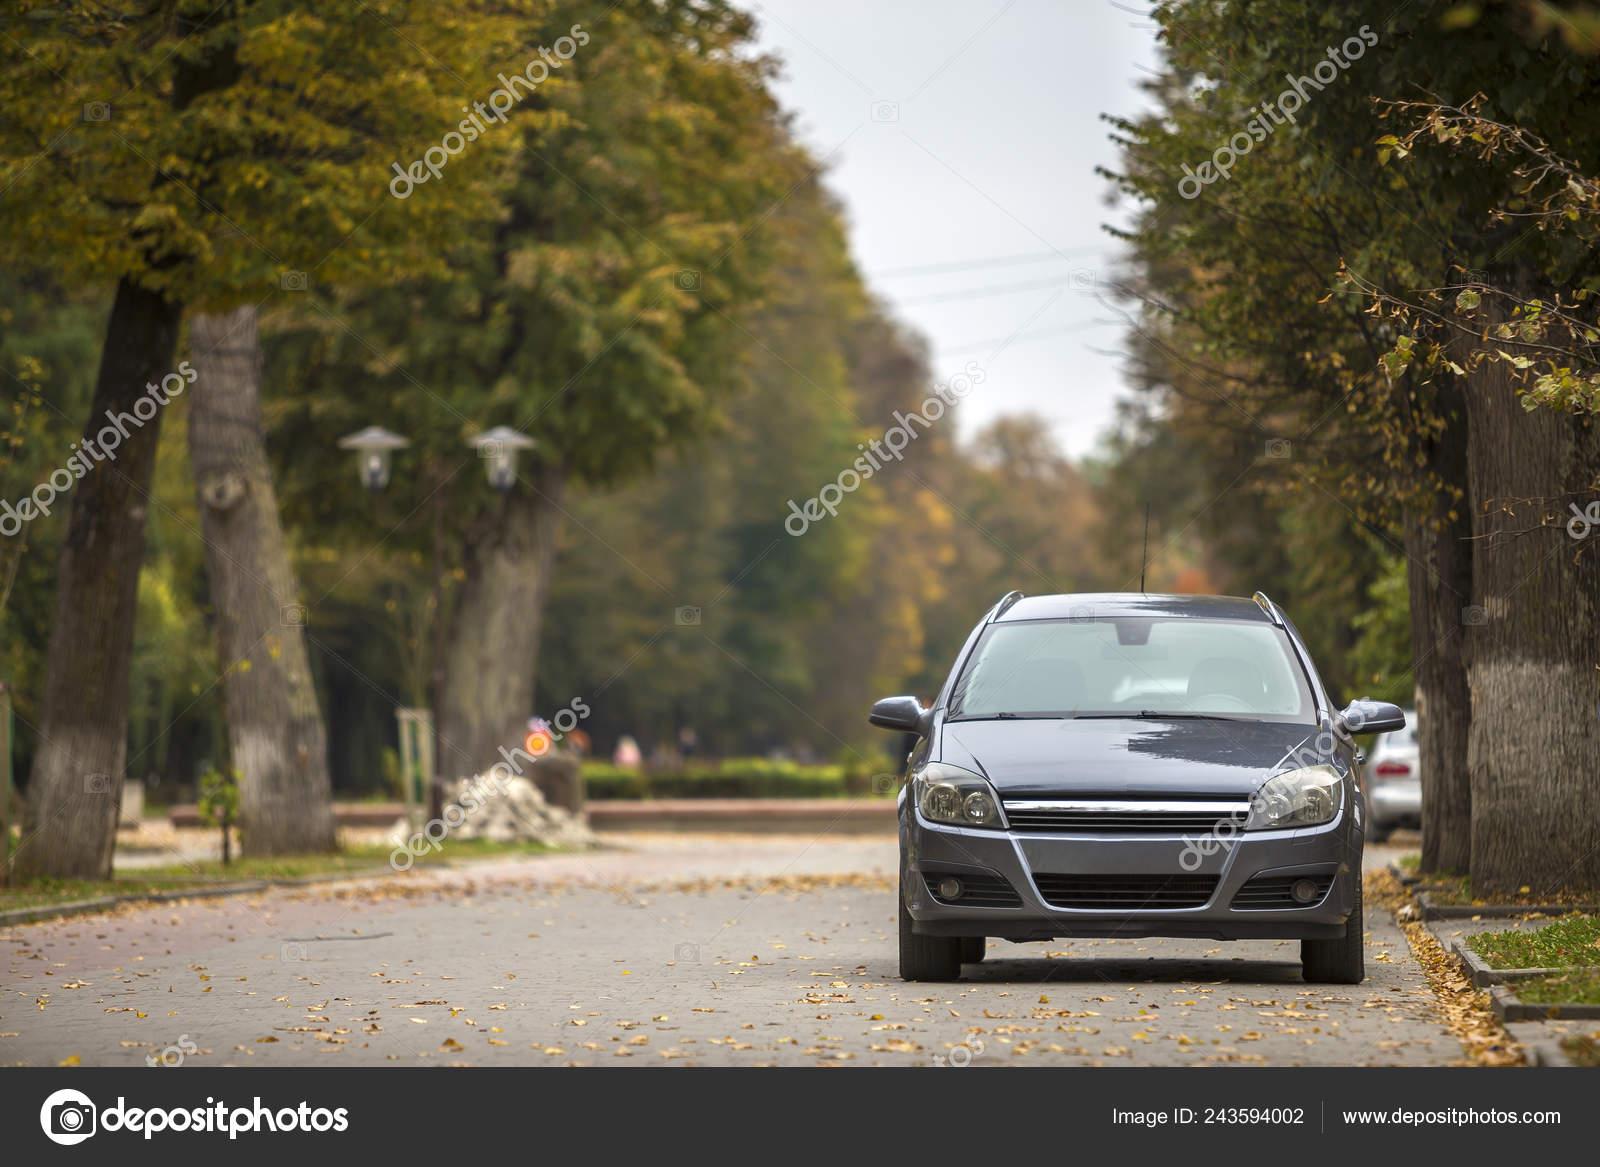 Gray Shiny Car Parked Quiet Area Asphalt Road Blurred Bokeh Stock Editorial Photo C Bilanol I Ua 243594002